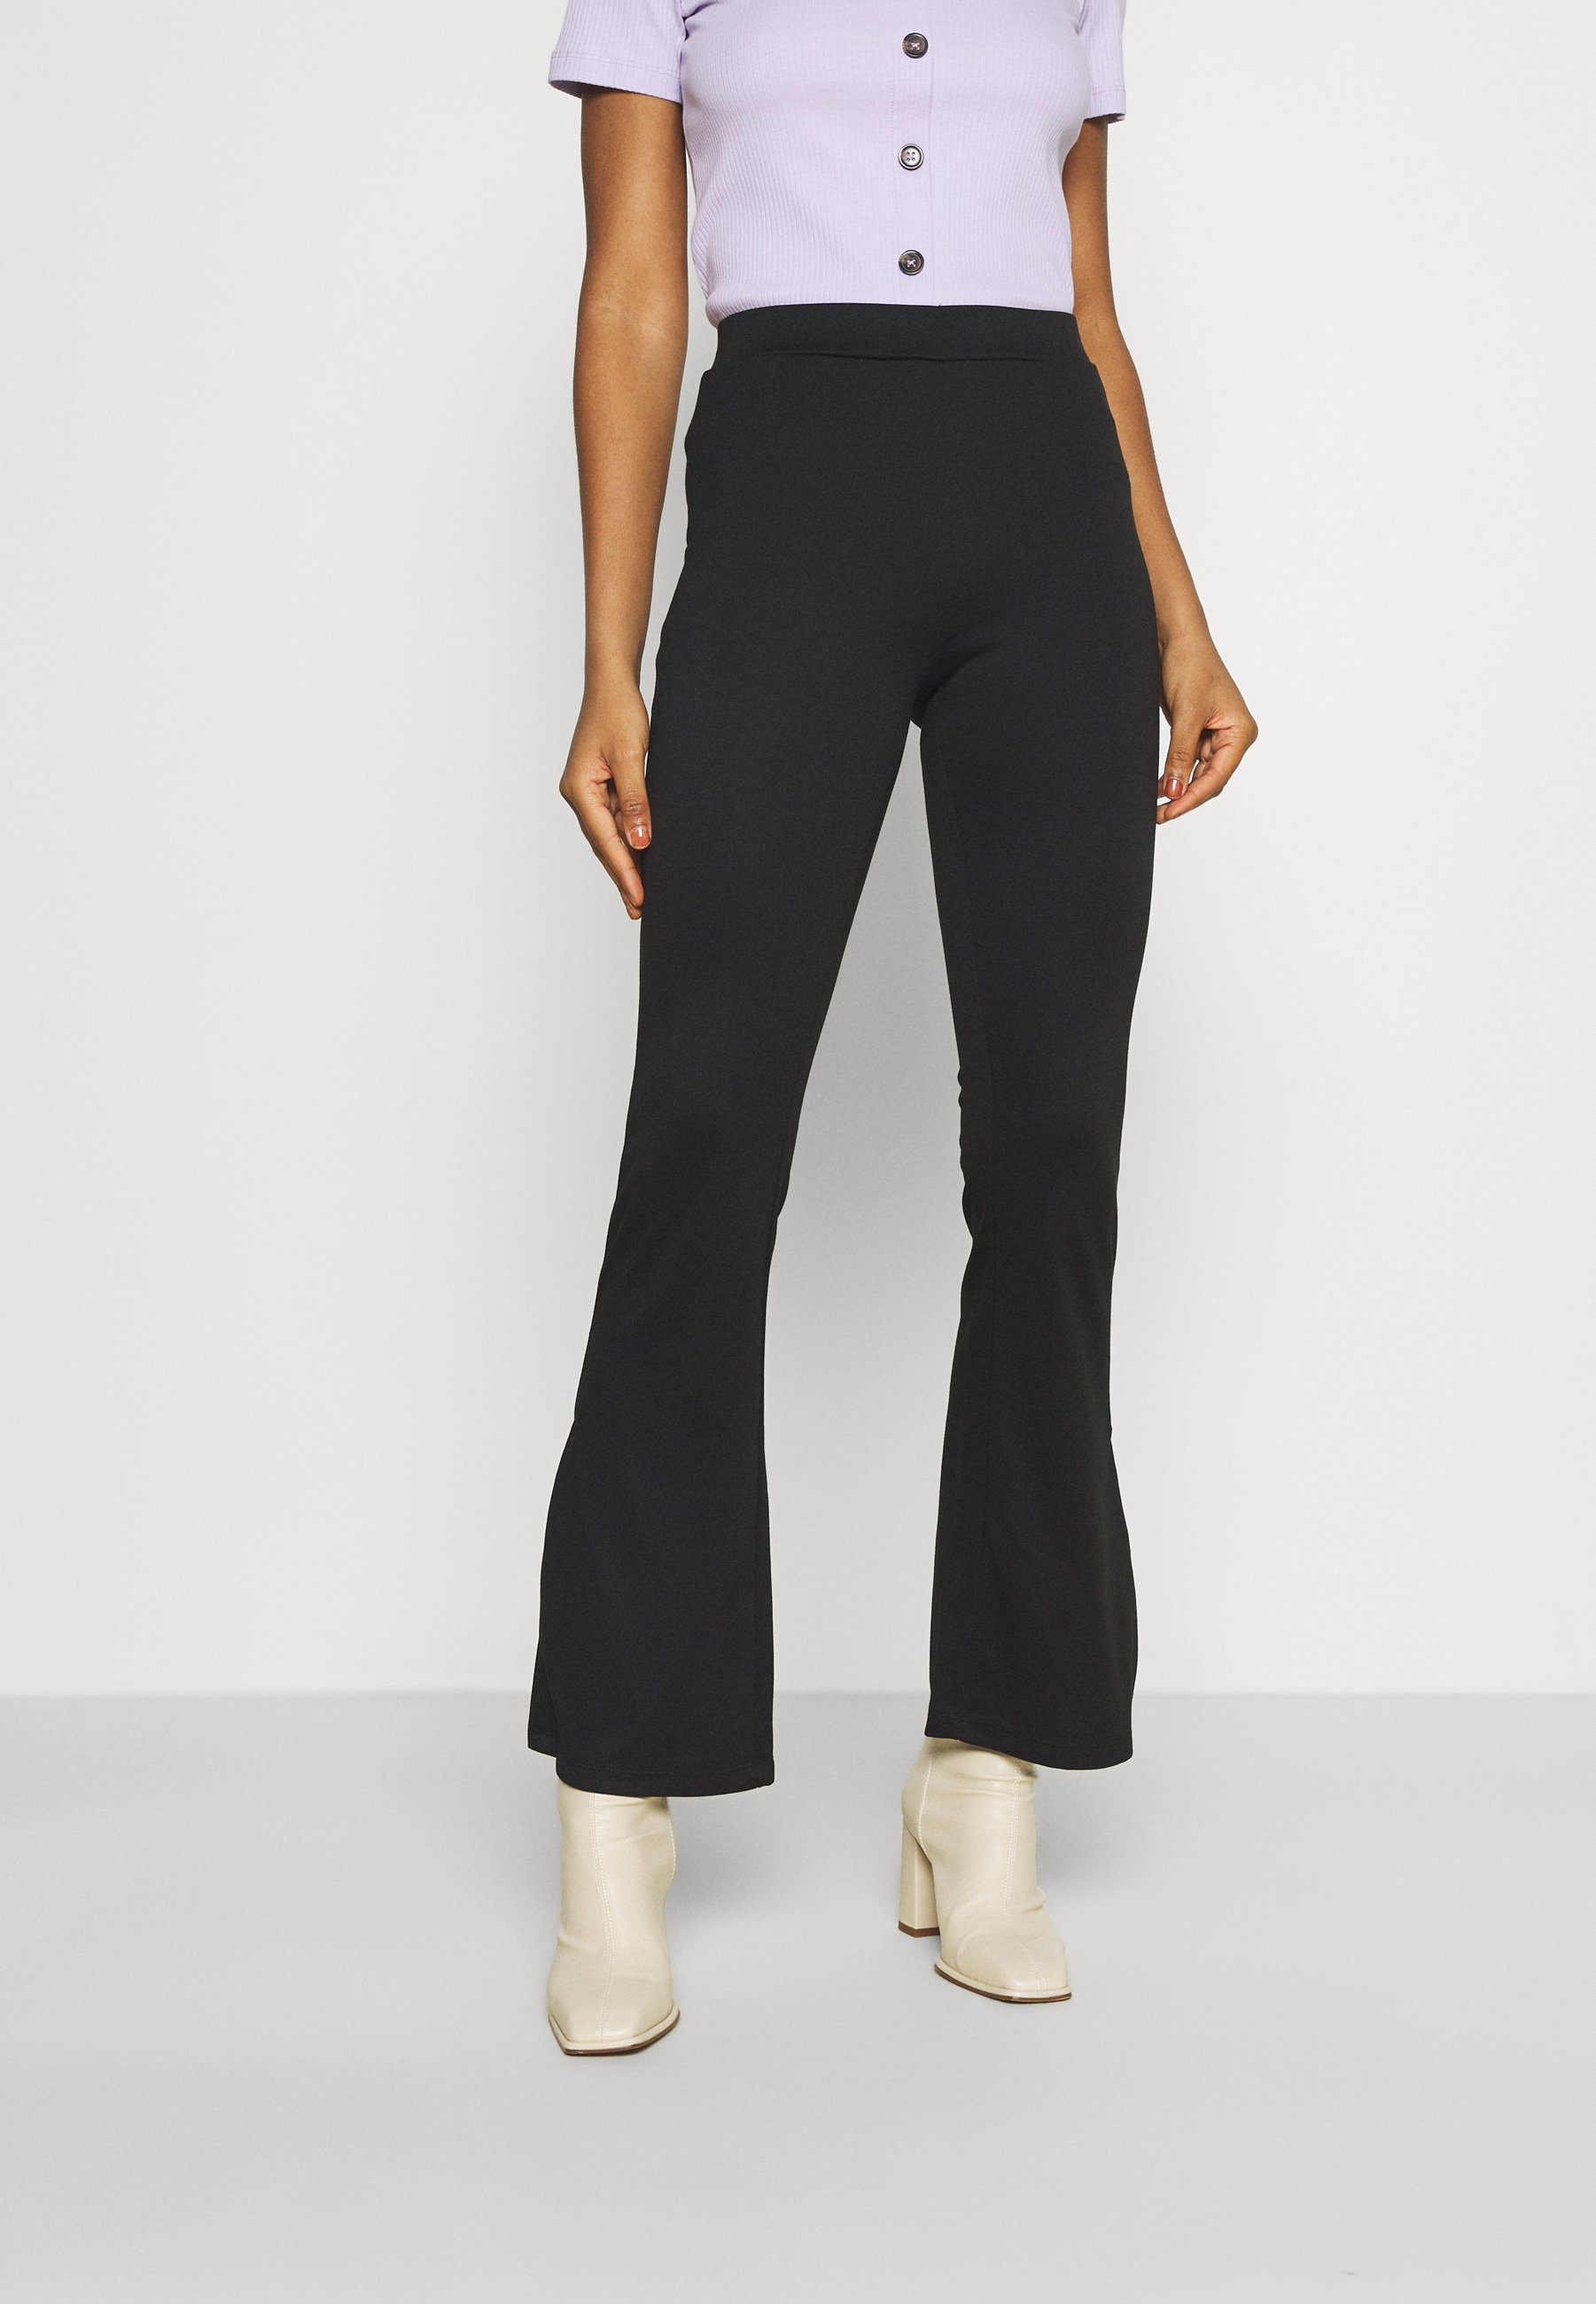 Women VITINNY FLARED - Leggings - Trousers